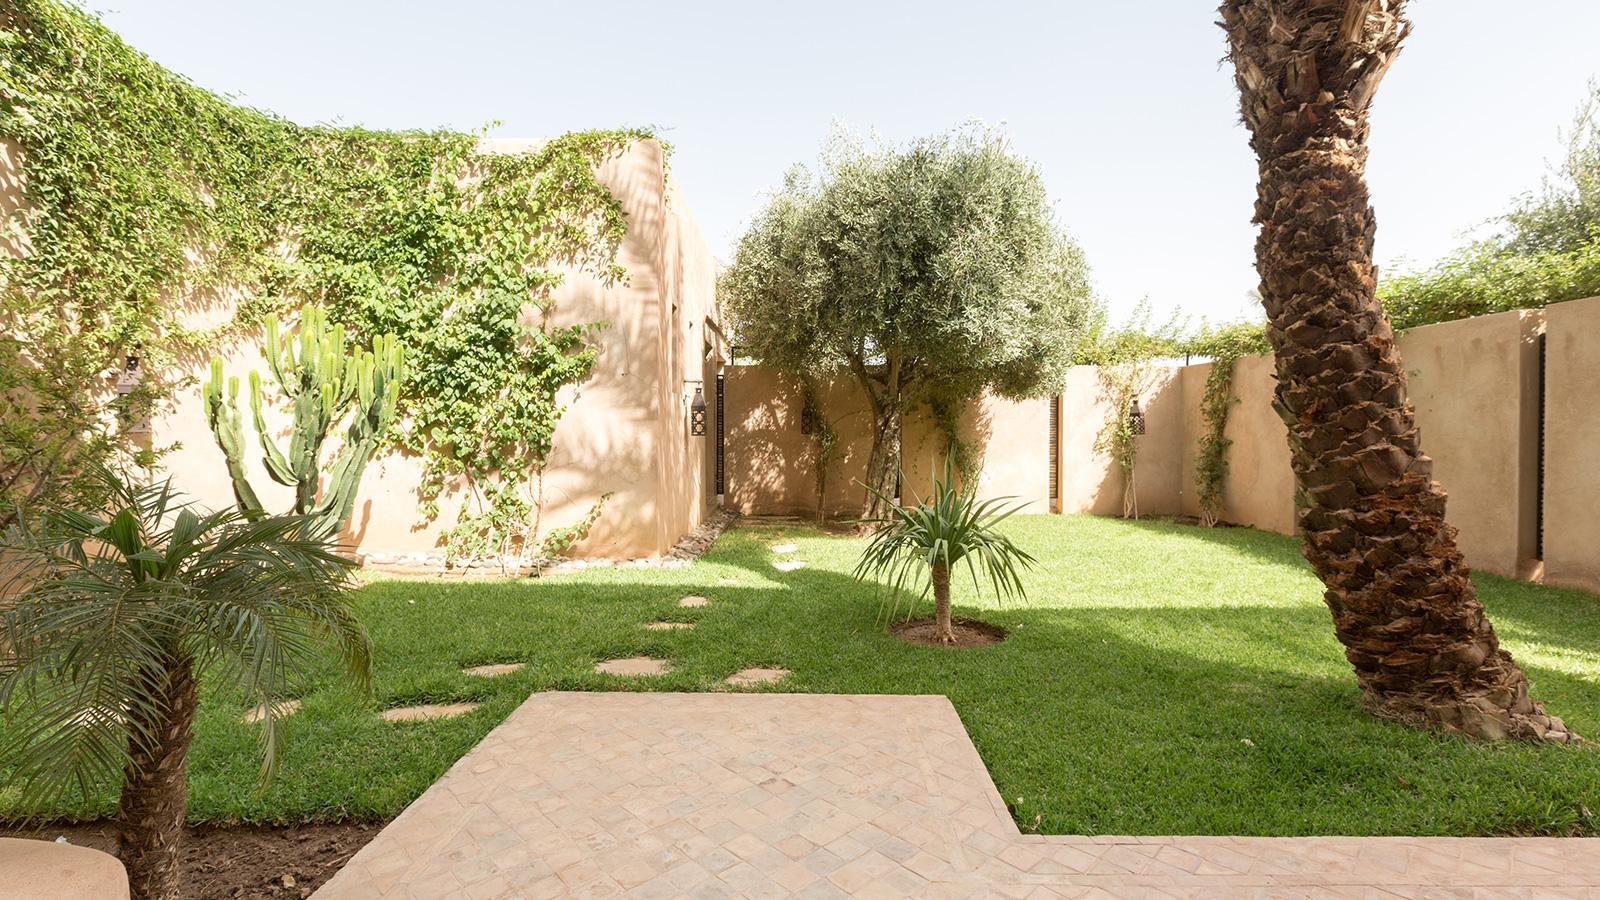 Vente villa de luxe à Marrakech